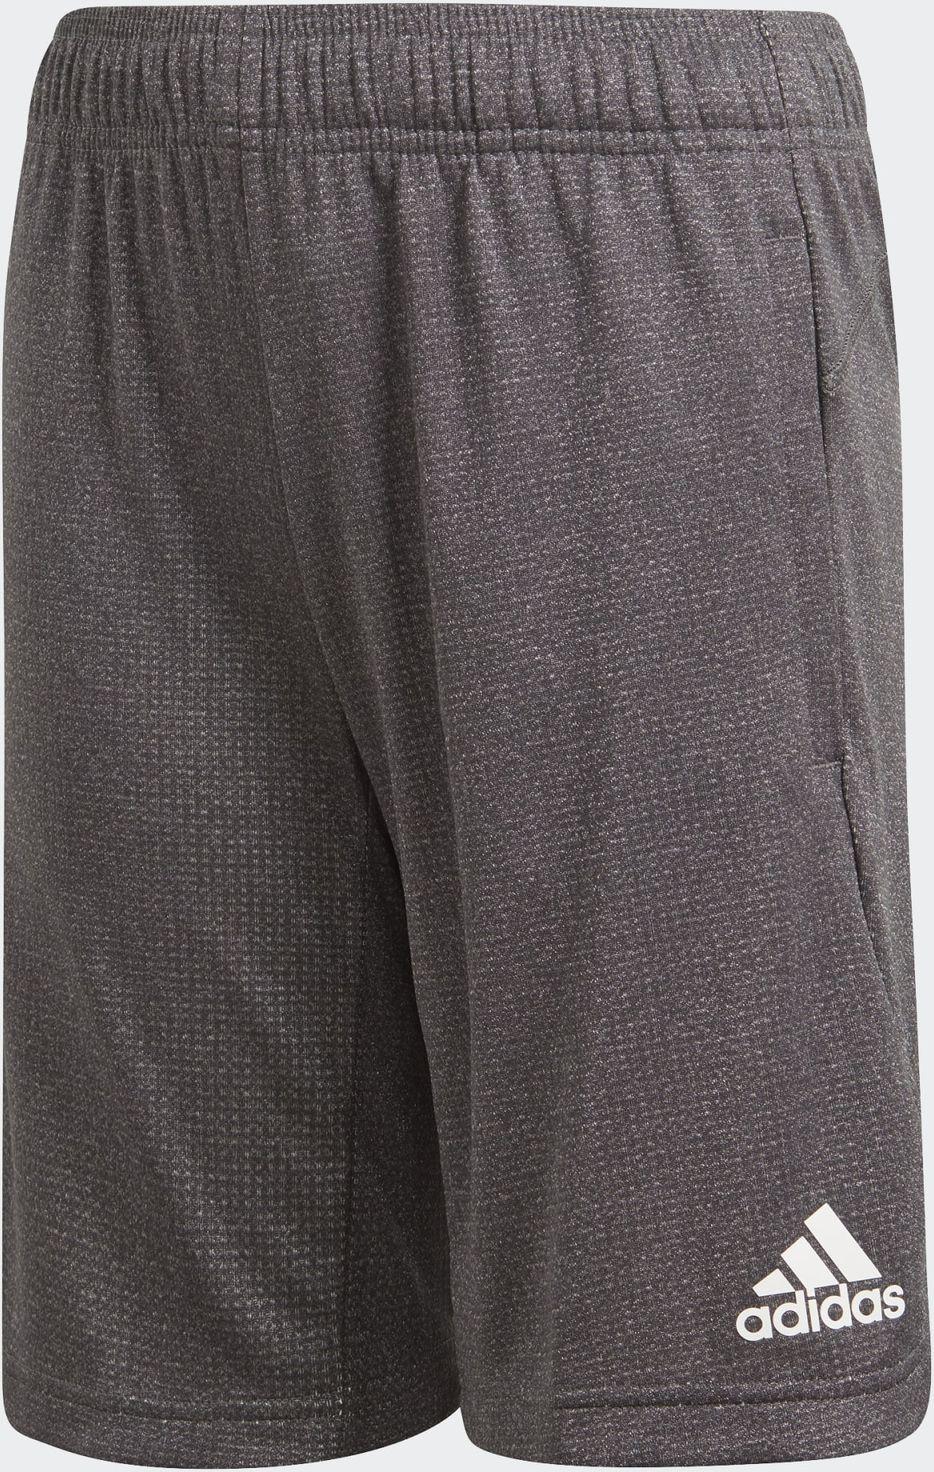 Шорты для мальчика Adidas Yb Tr Chill Sh, цвет: черный. DV1406. Размер 164DV1406